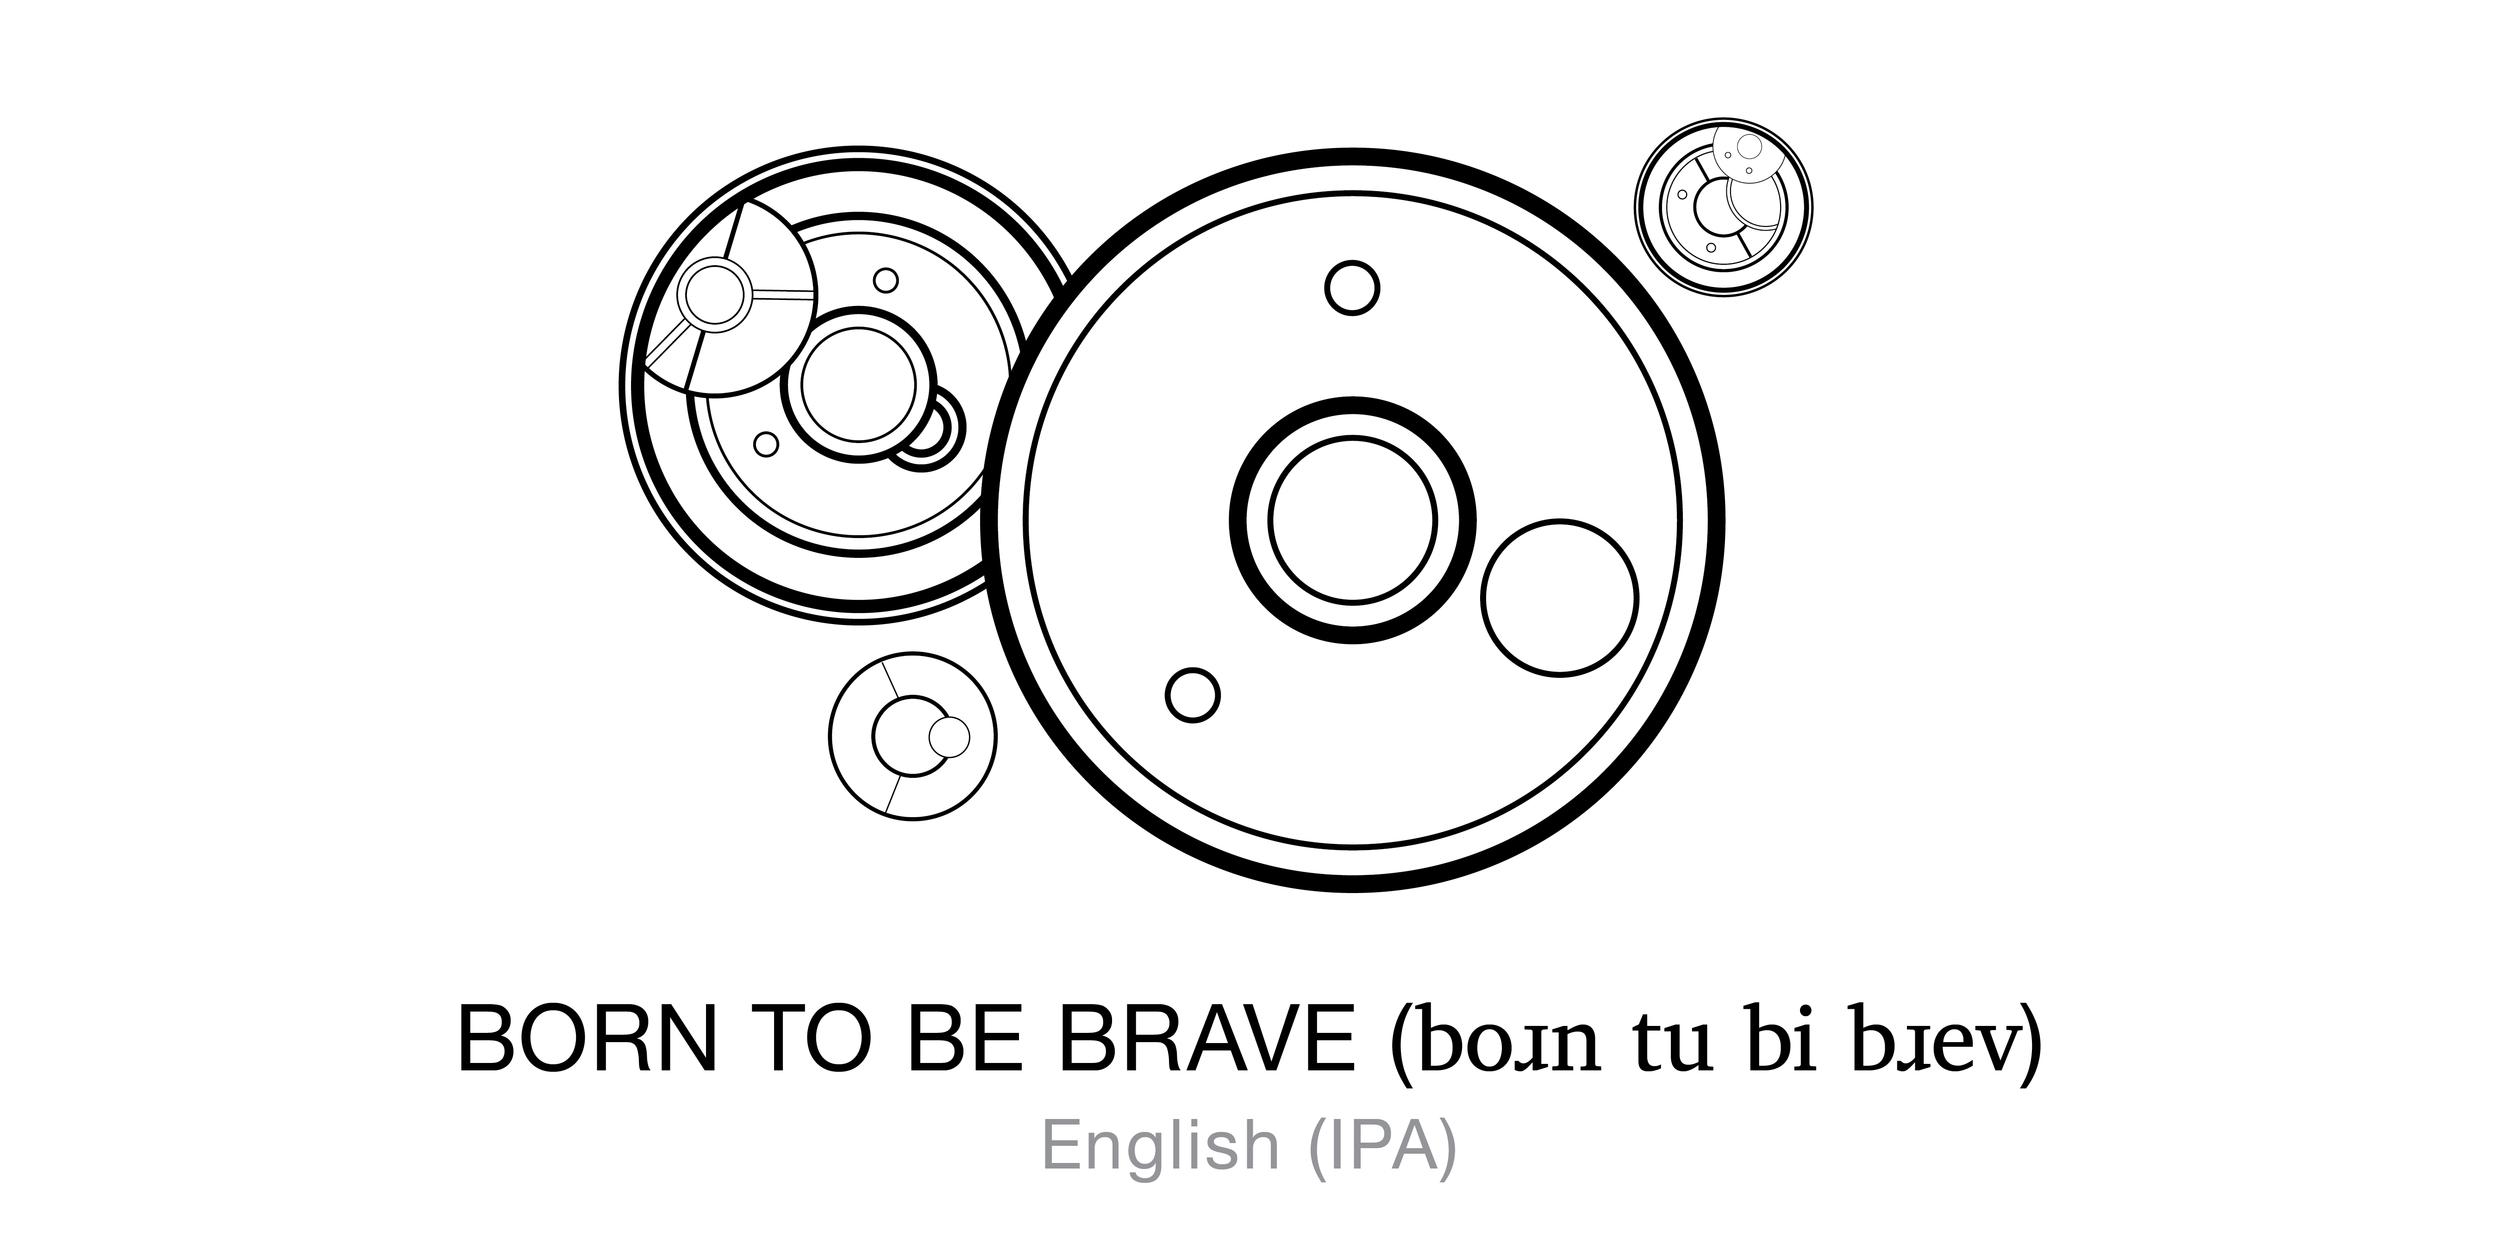 BornToBeBrave-02.png